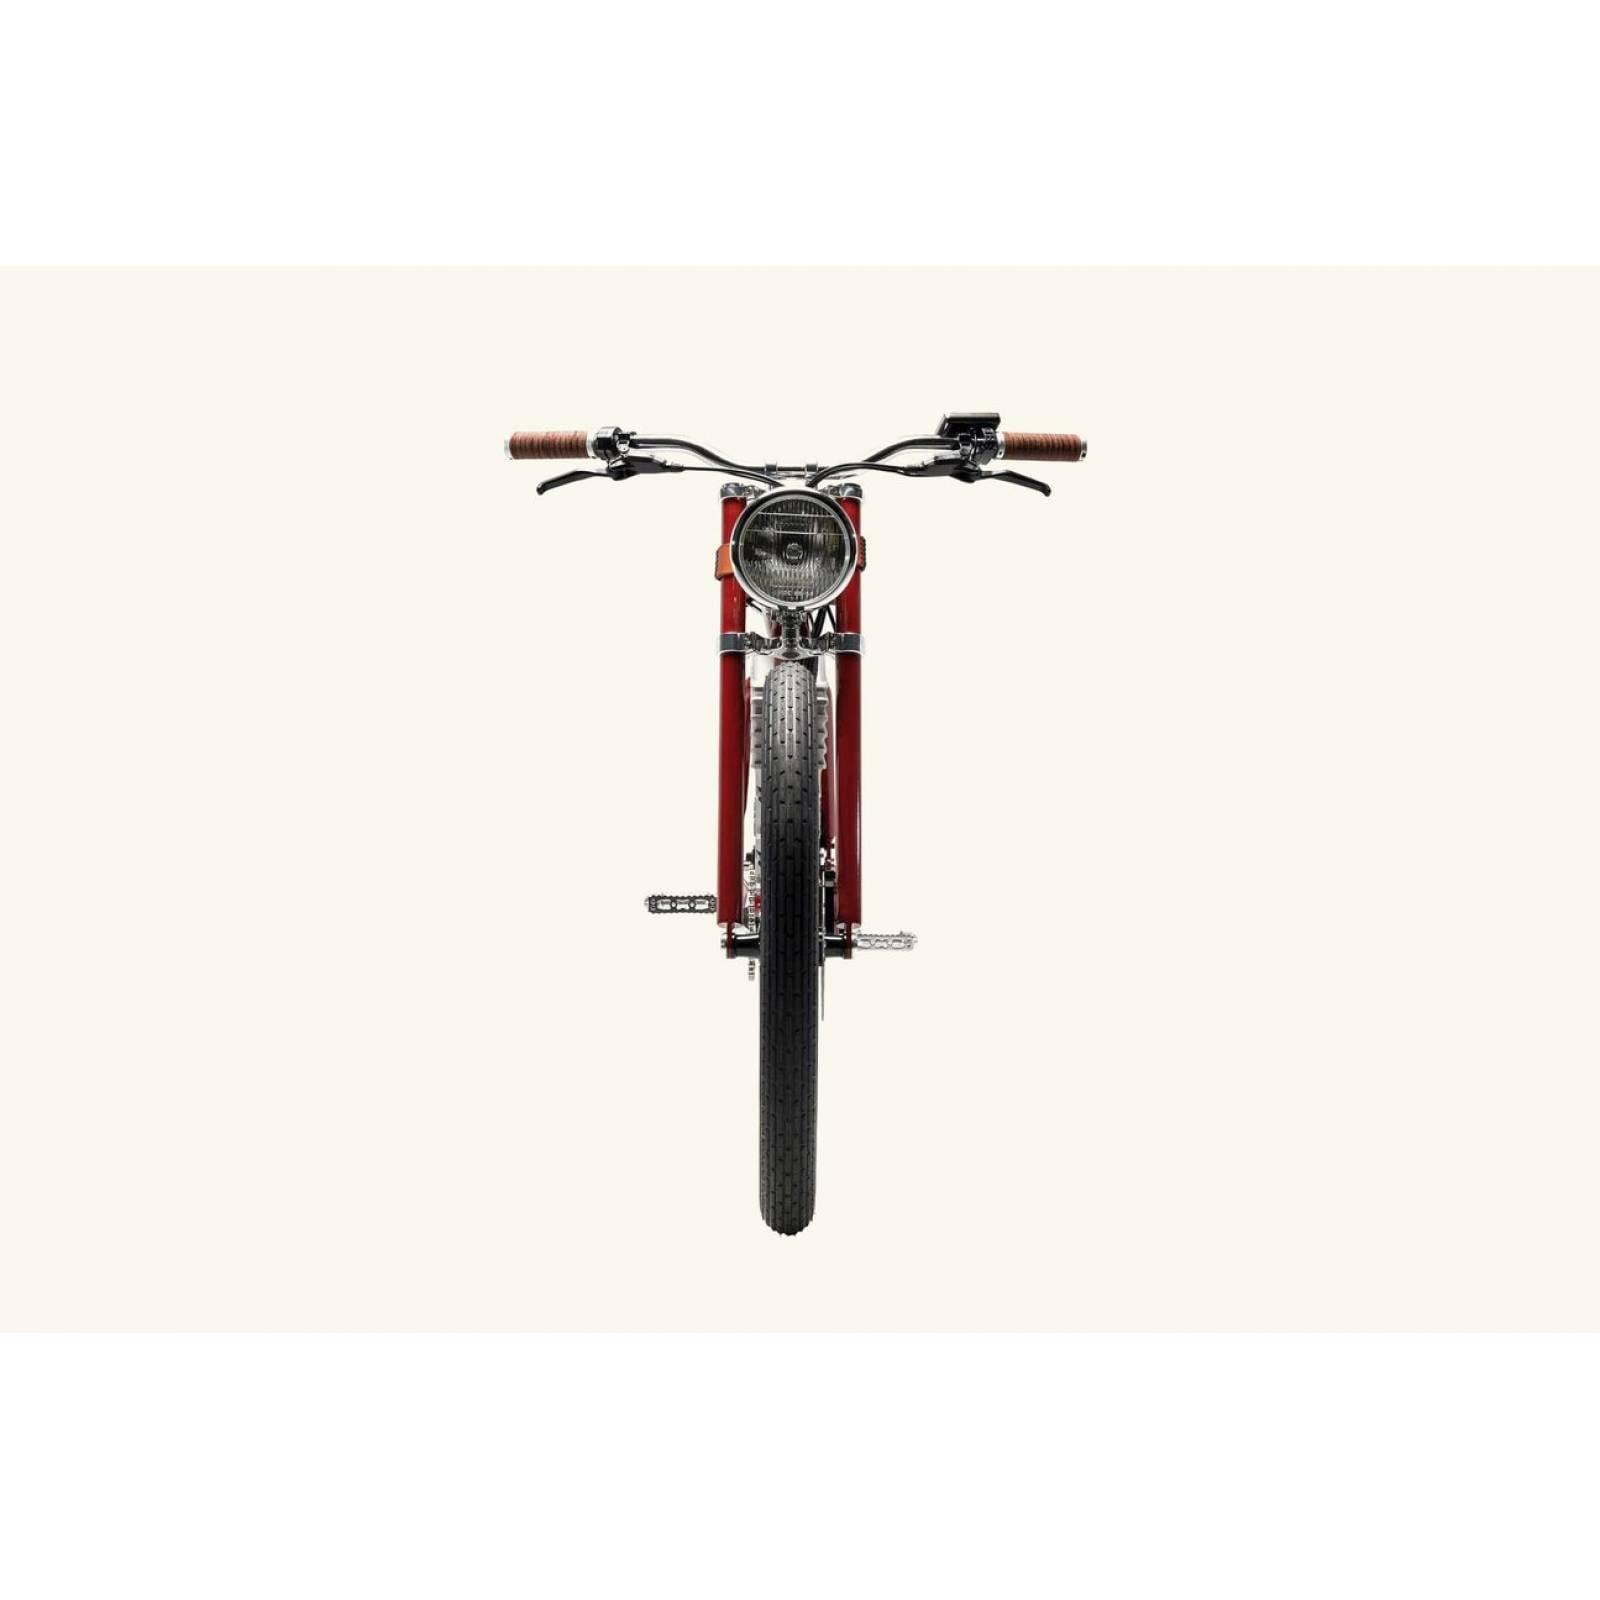 Bicicleta Electrica Recargable Traker 2019 R-26 Roja Vintage Electric Bikes